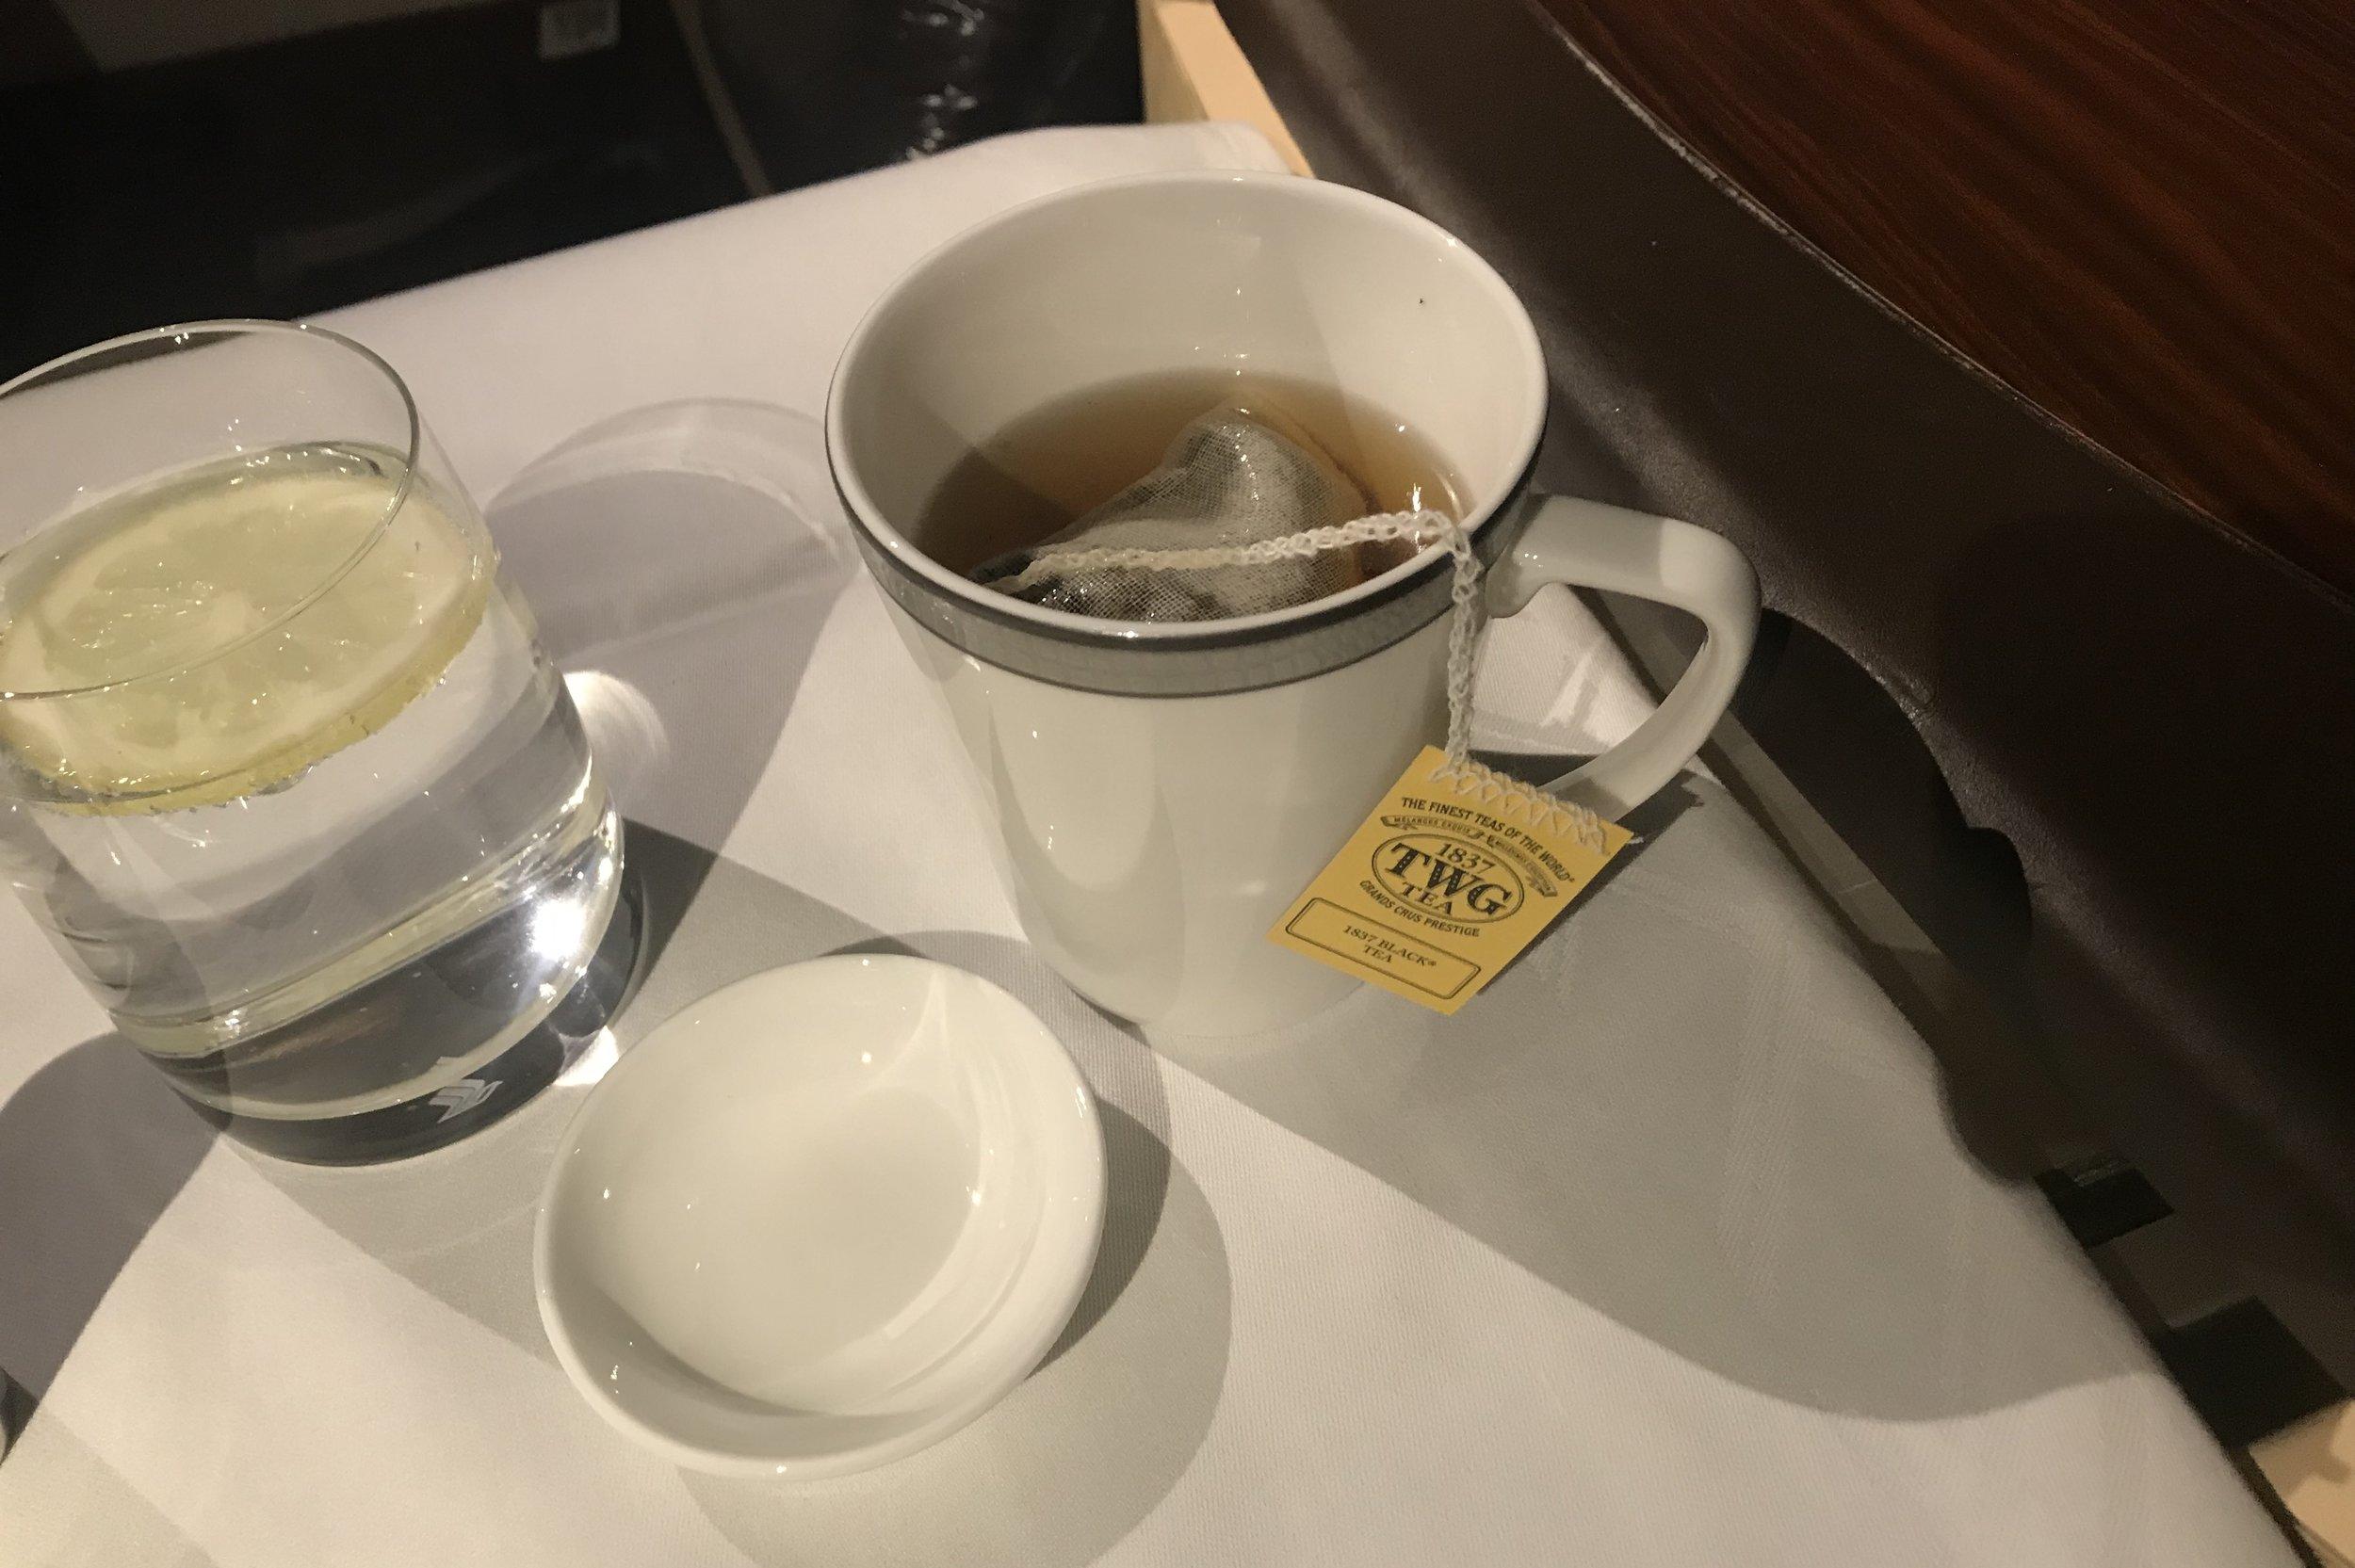 Singapore Airlines Suites Class – 1837 Black Tea